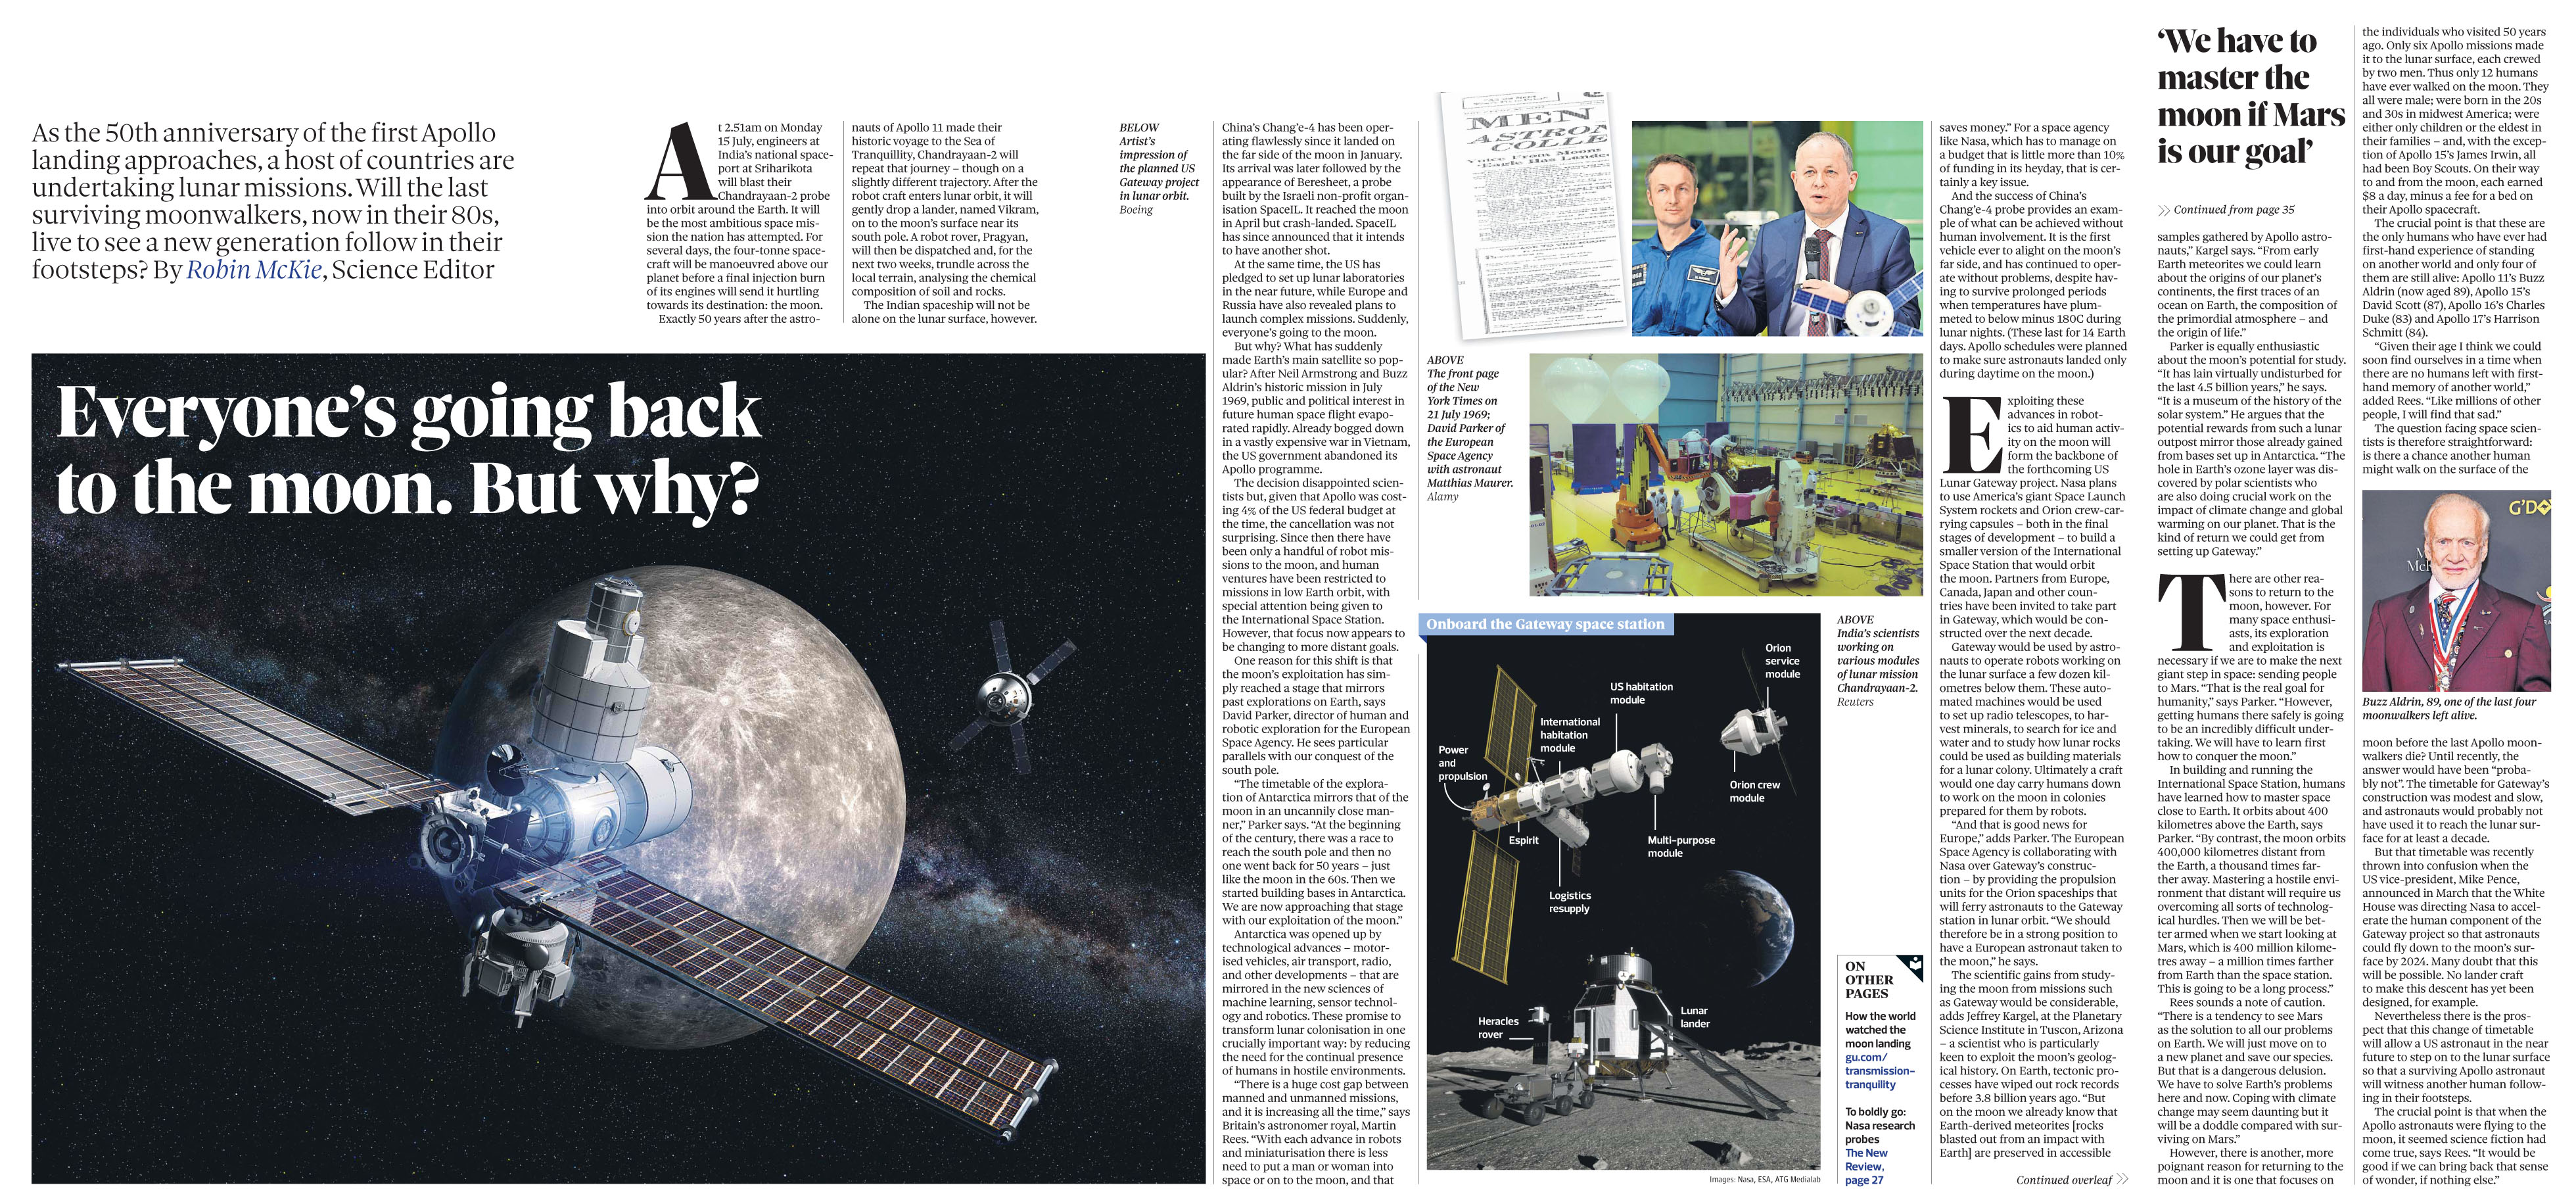 The Observer - July 7 2019 Moon.jpg